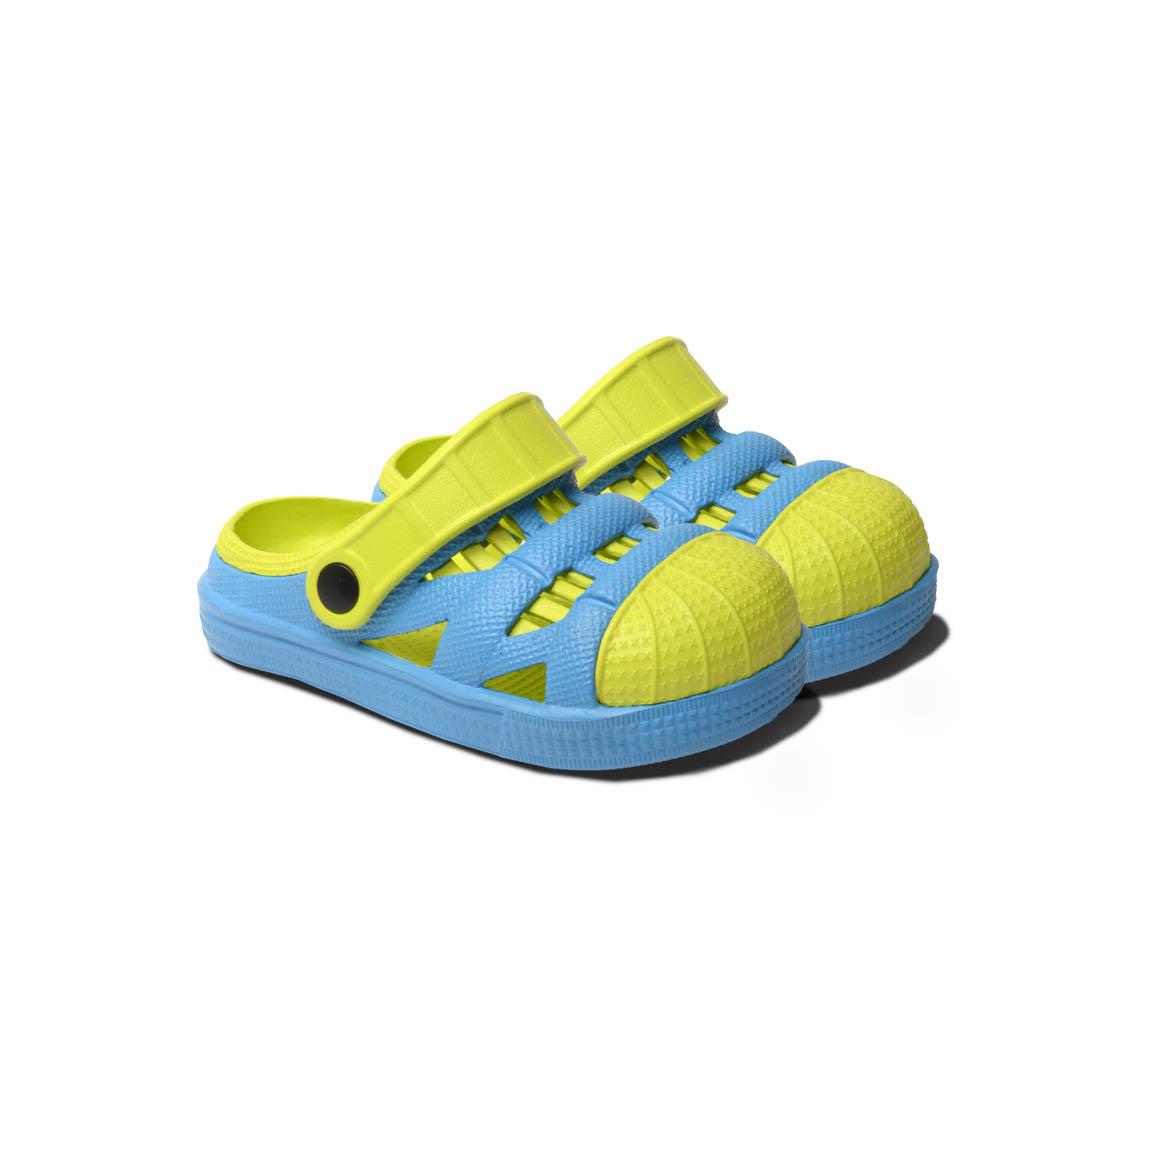 Kids Lightweight Sandals - Blue/Lime | Trada Marketplace